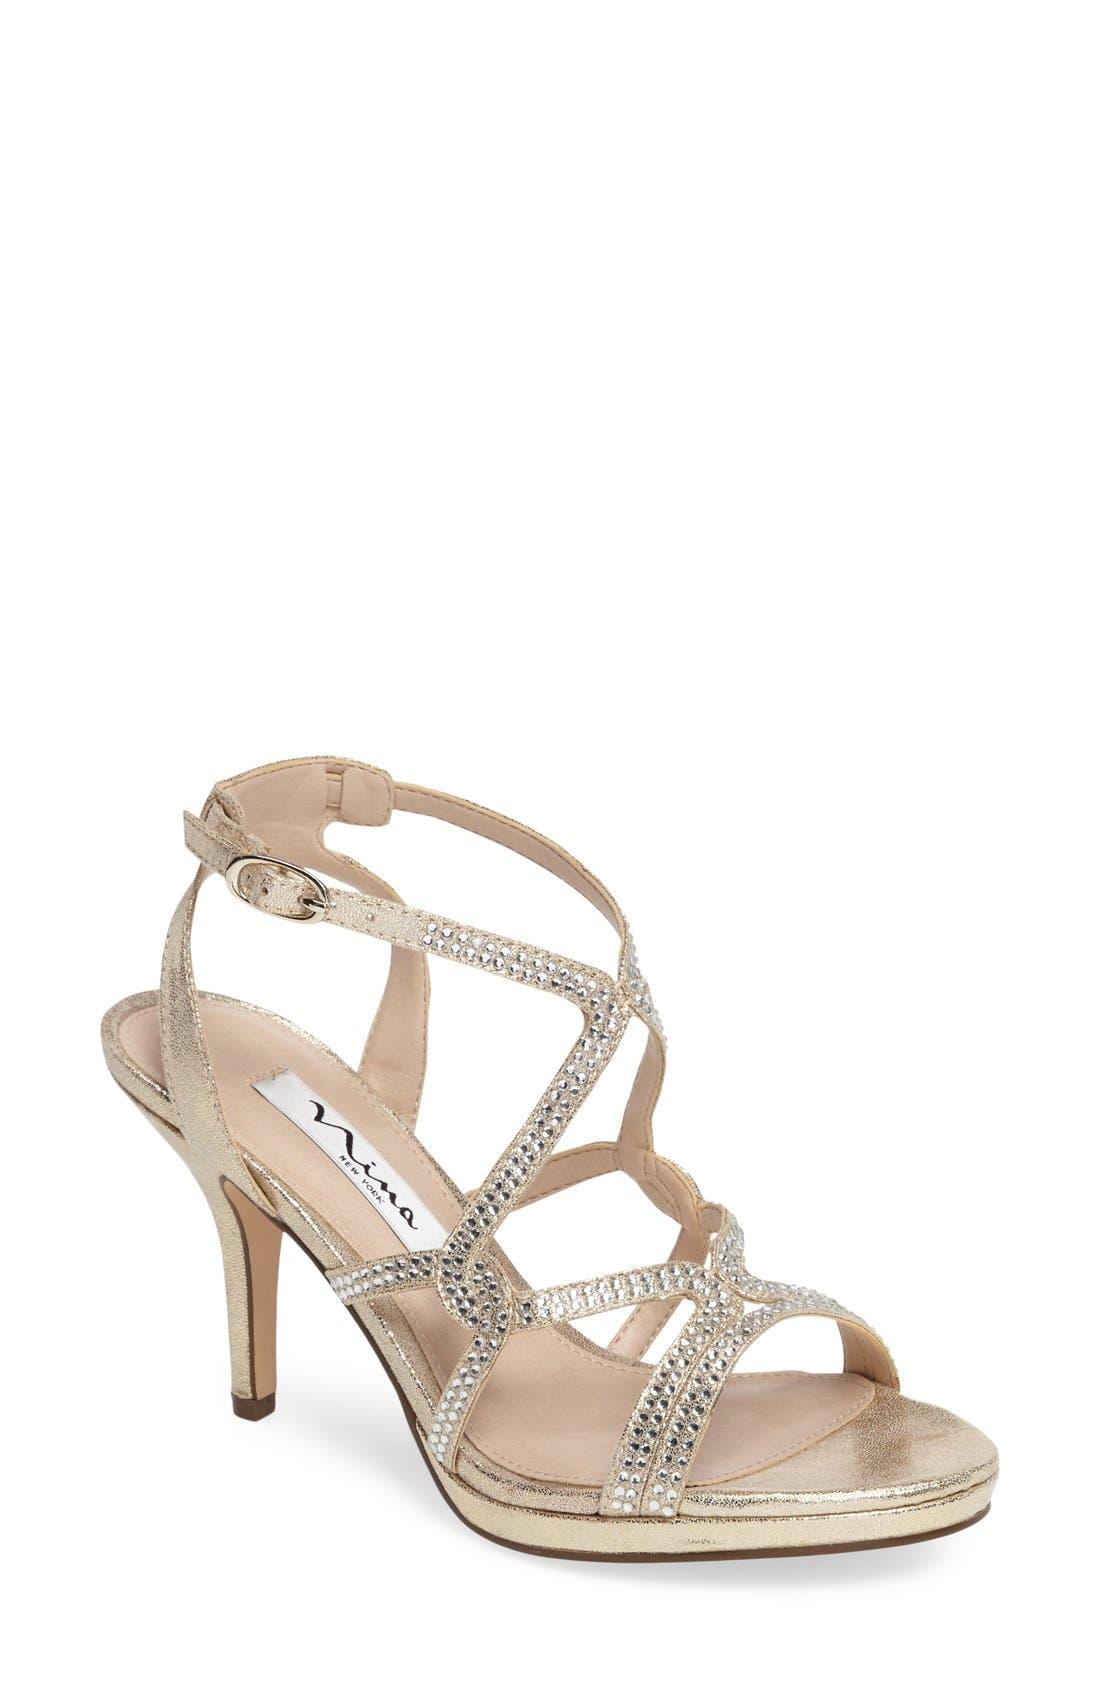 Alternate Image 1 Selected - Nina Varsha Crystal Embellished Evening Sandal (Women)